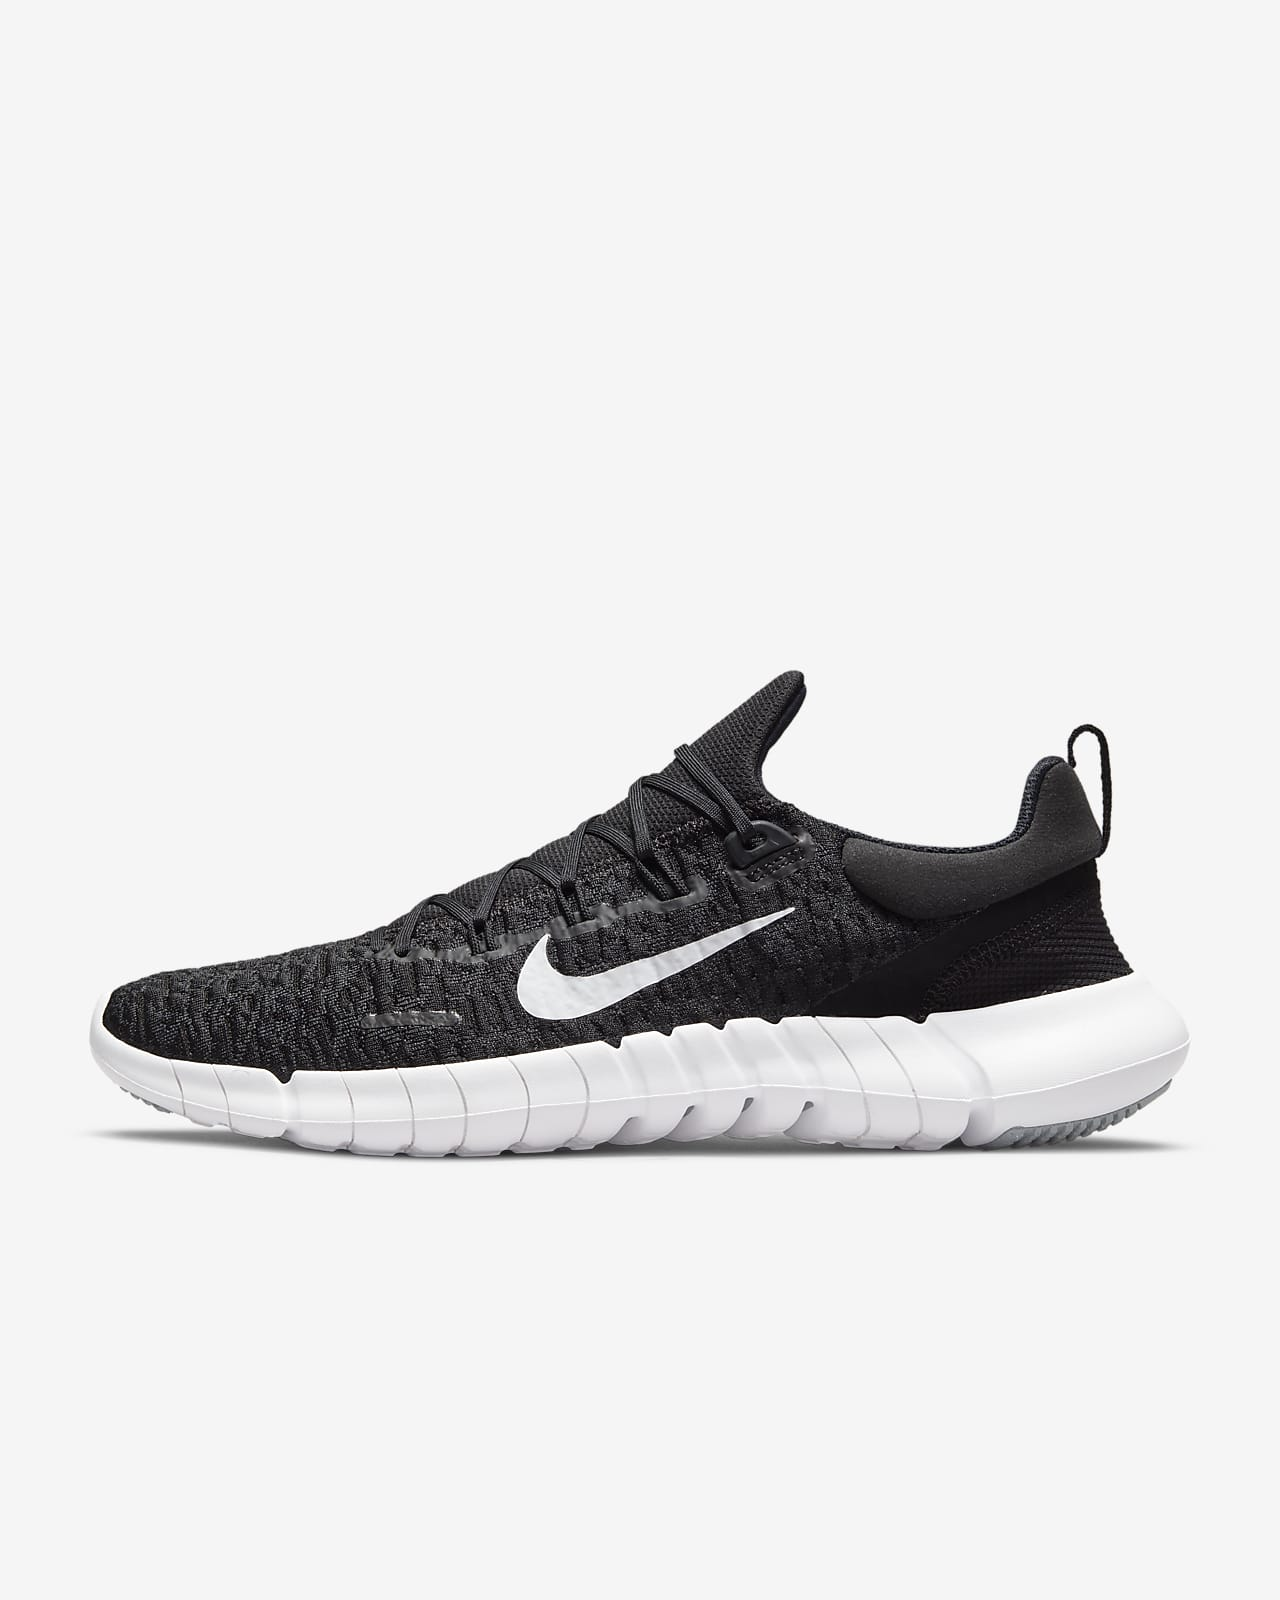 Мужские кроссовки для бега по шоссе Nike Free Run 5.0